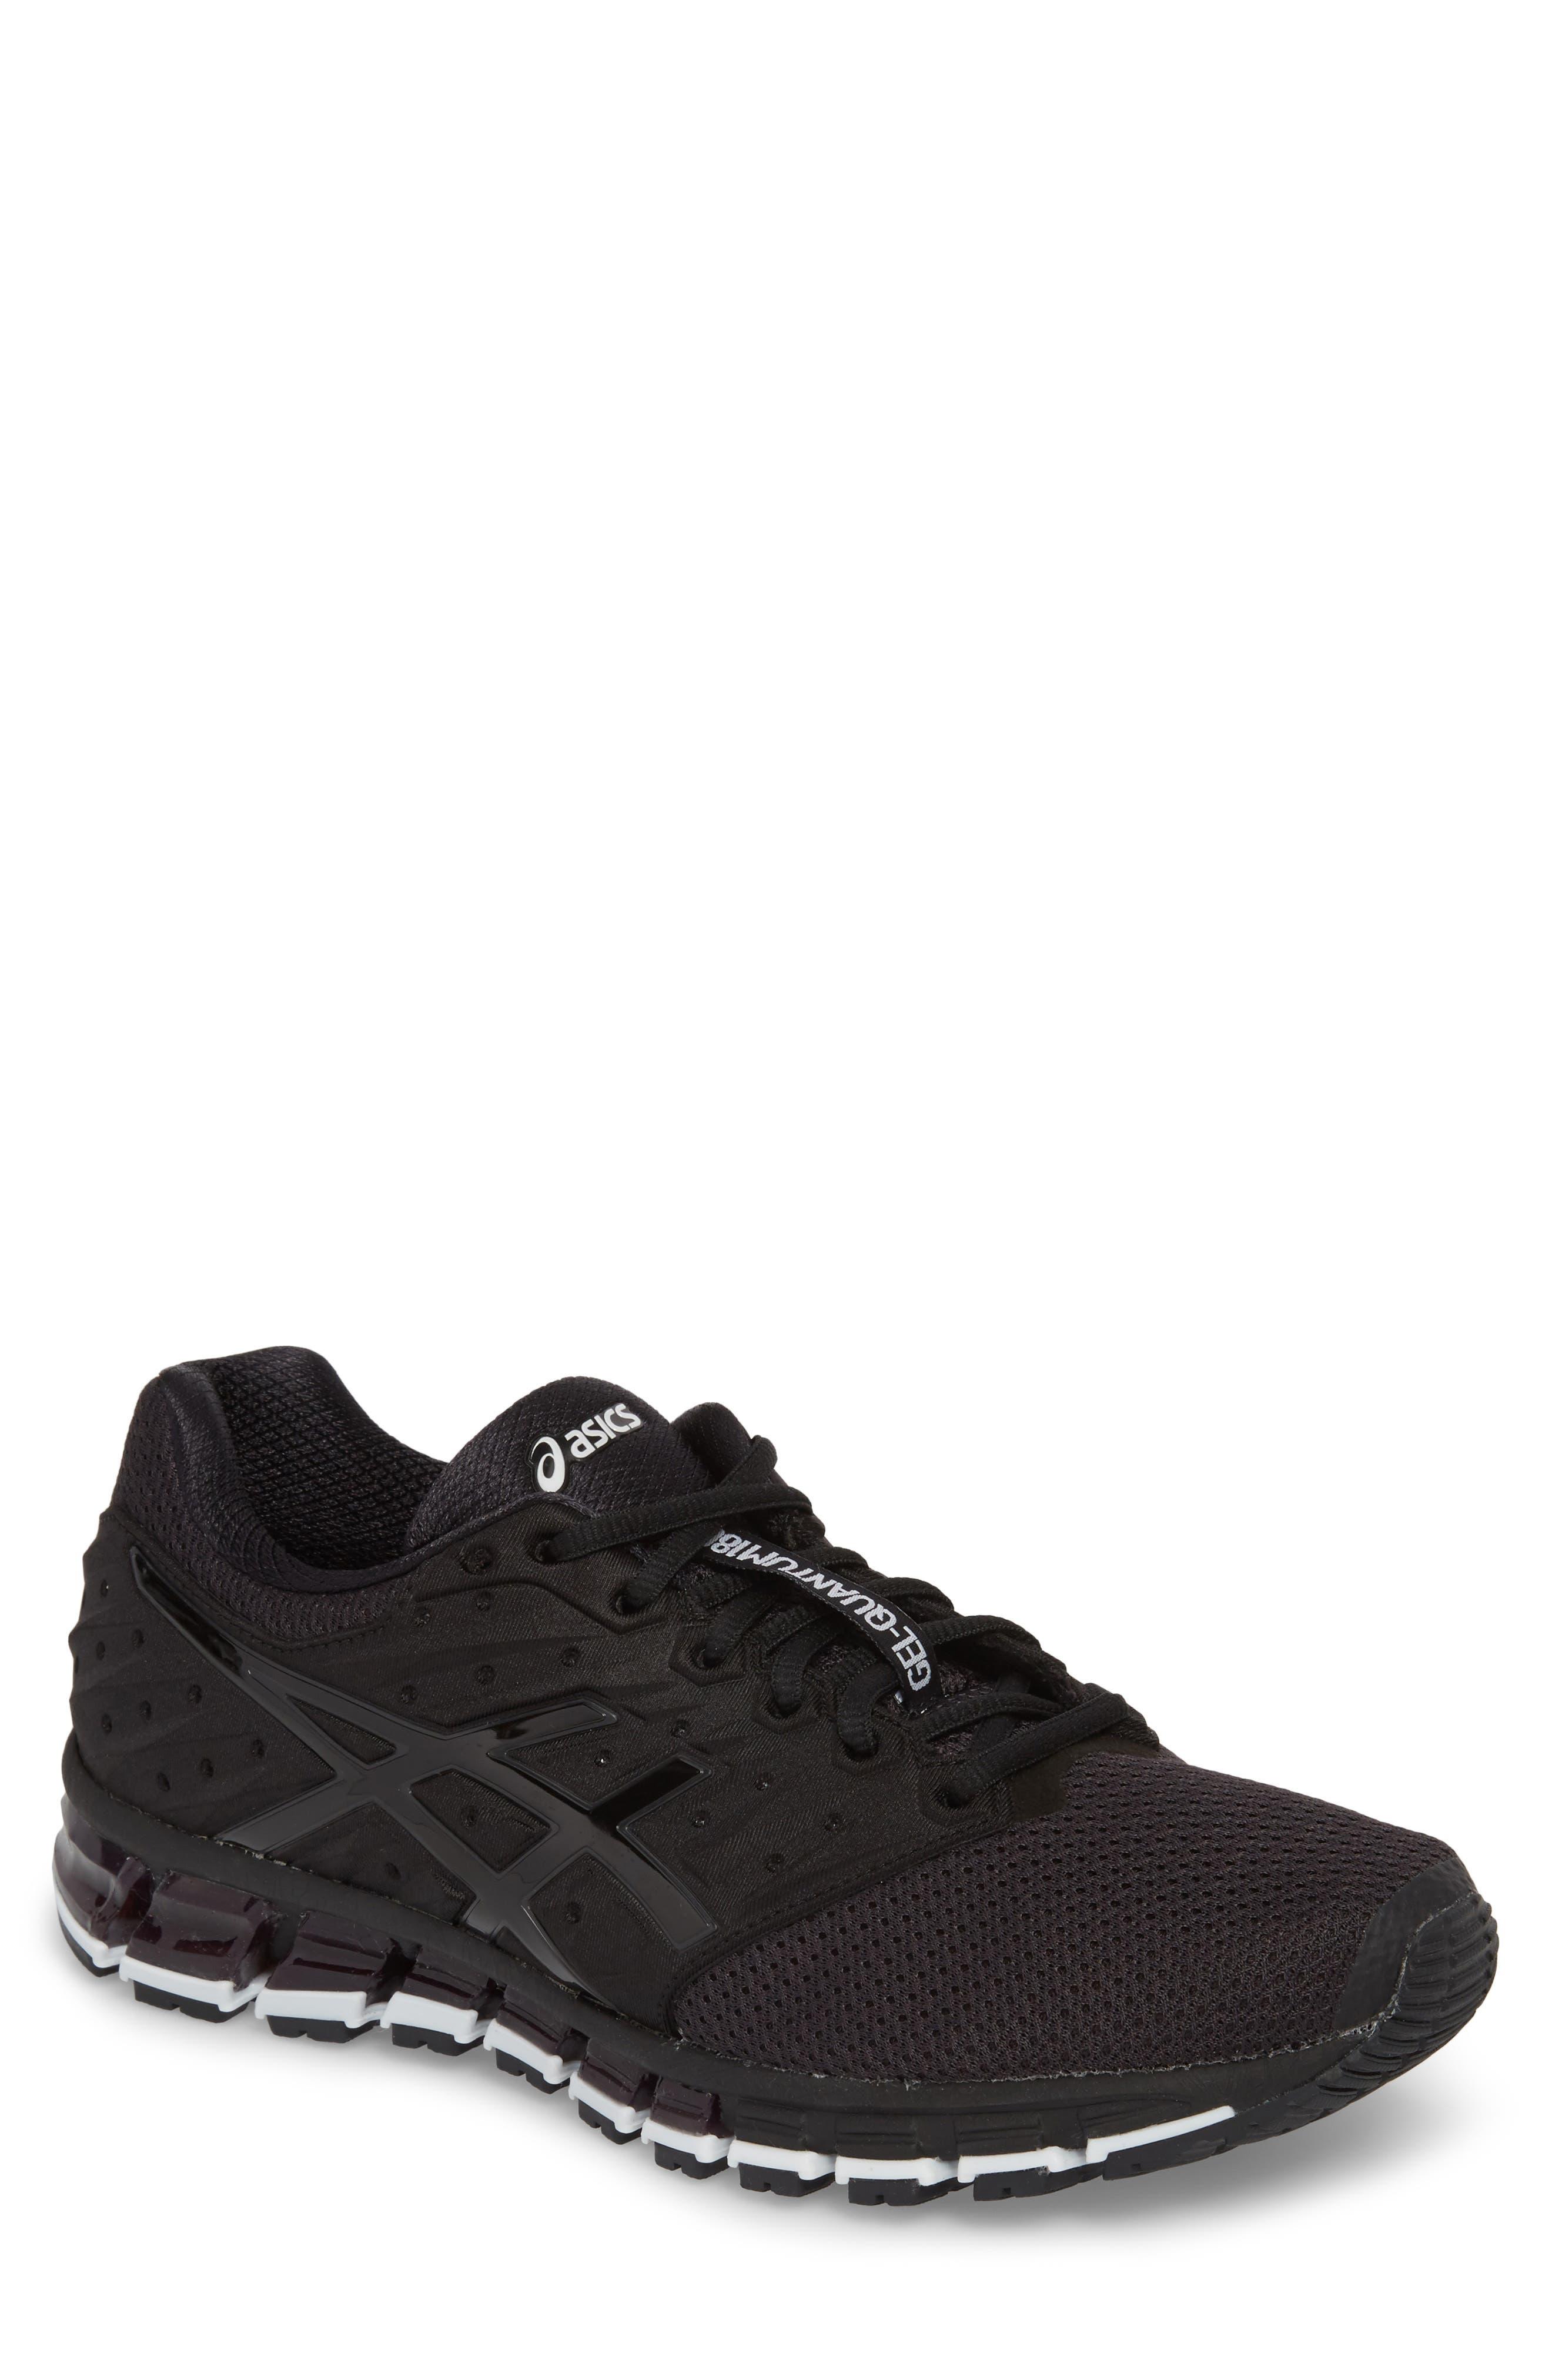 GEL-Quantum 180 2 MX Running Shoe,                         Main,                         color, Phantom/ Black/ White